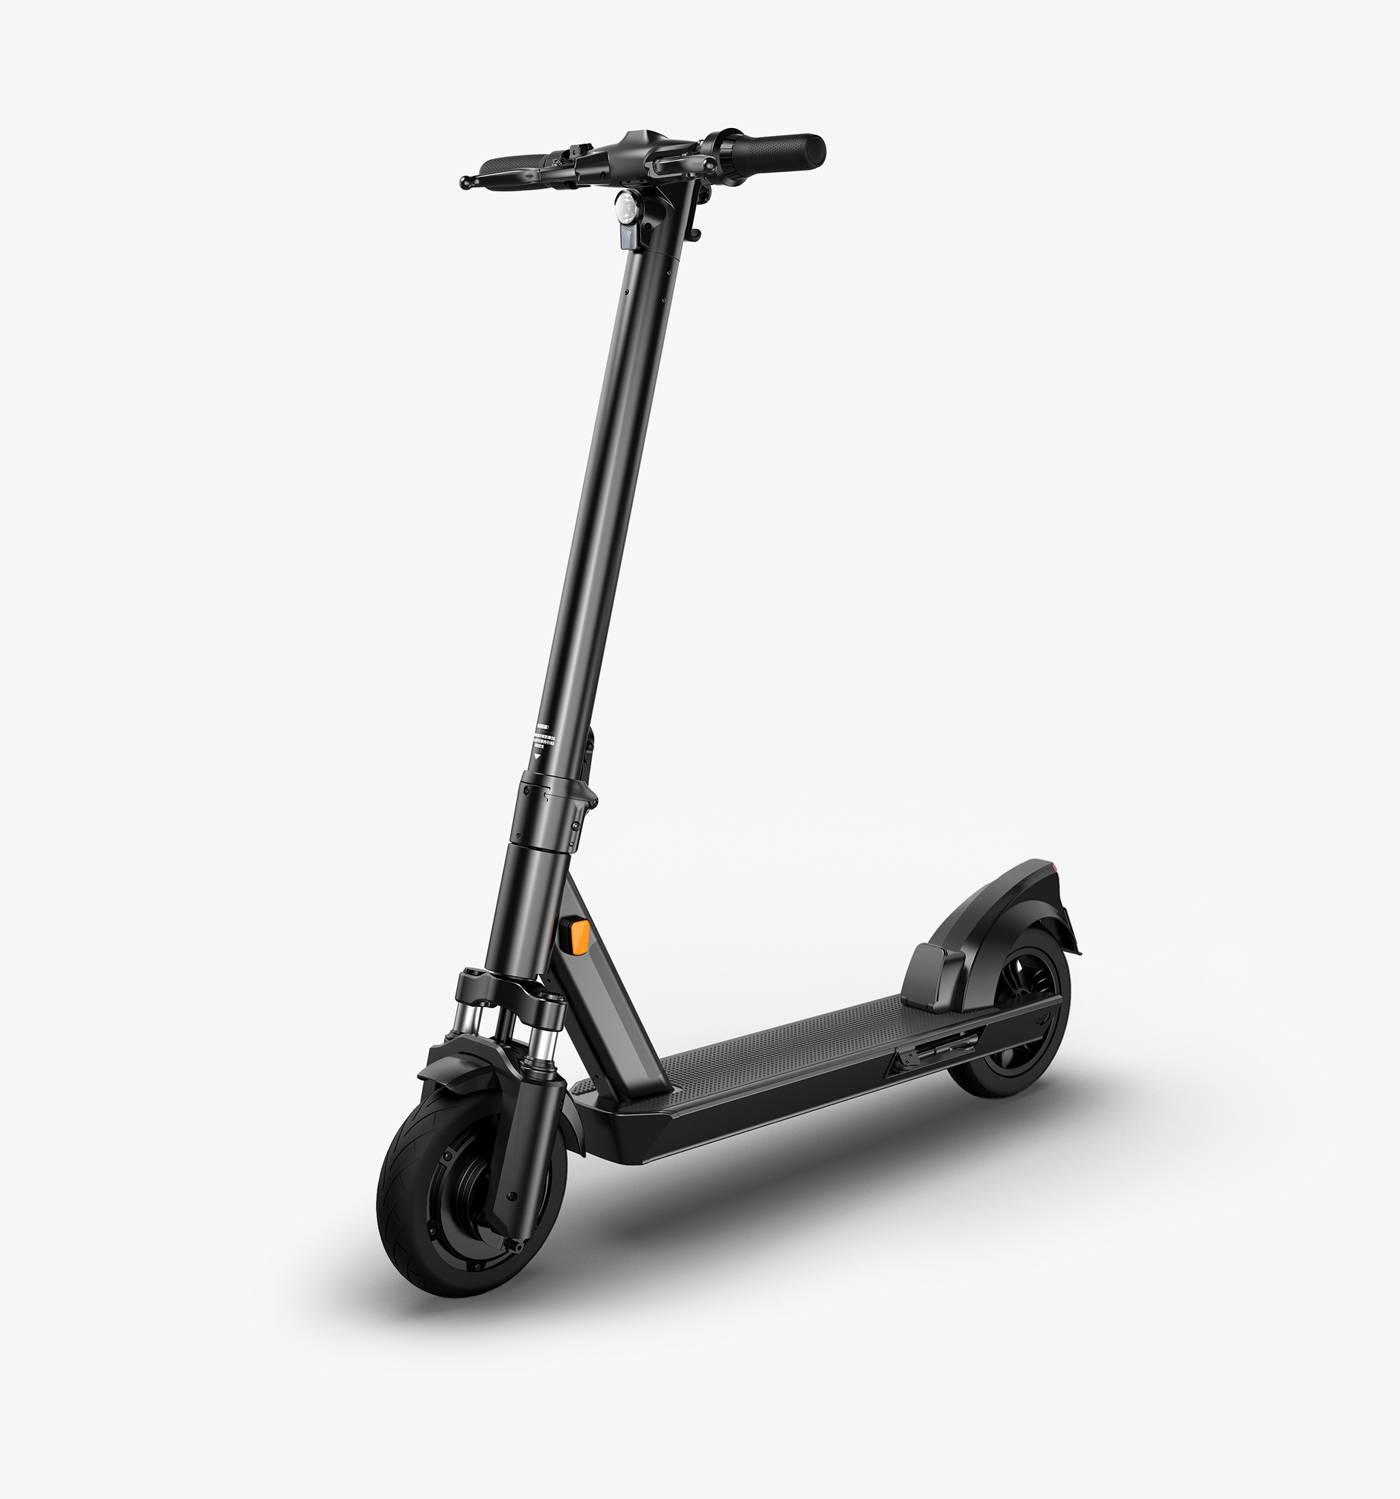 Okai-e-scooter-es200-electric-vehicle-hero